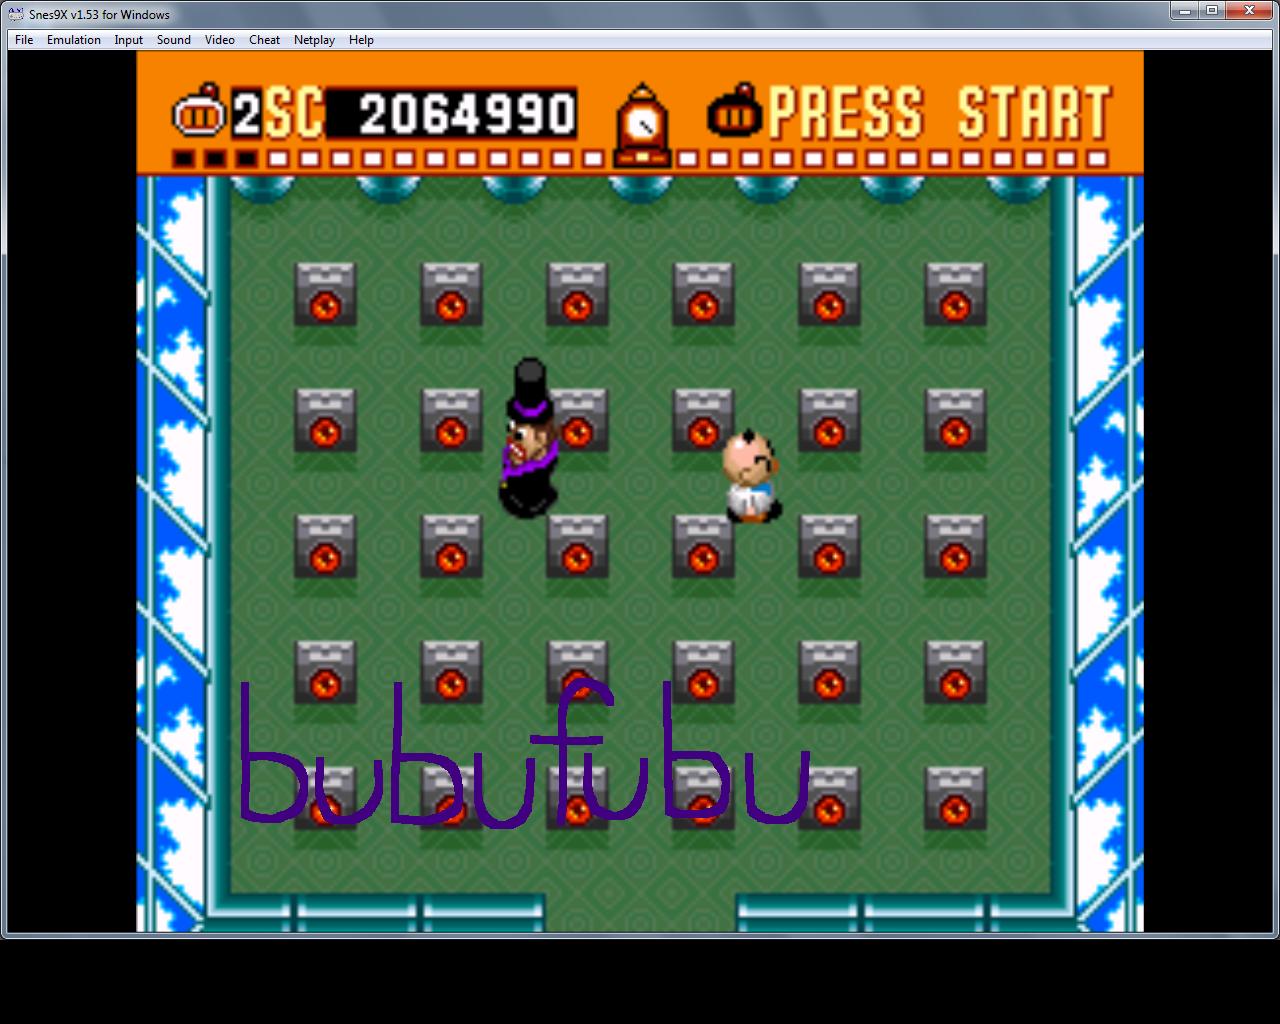 bubufubu: Super Bomberman (SNES/Super Famicom Emulated) 2,064,990 points on 2015-08-25 15:35:59